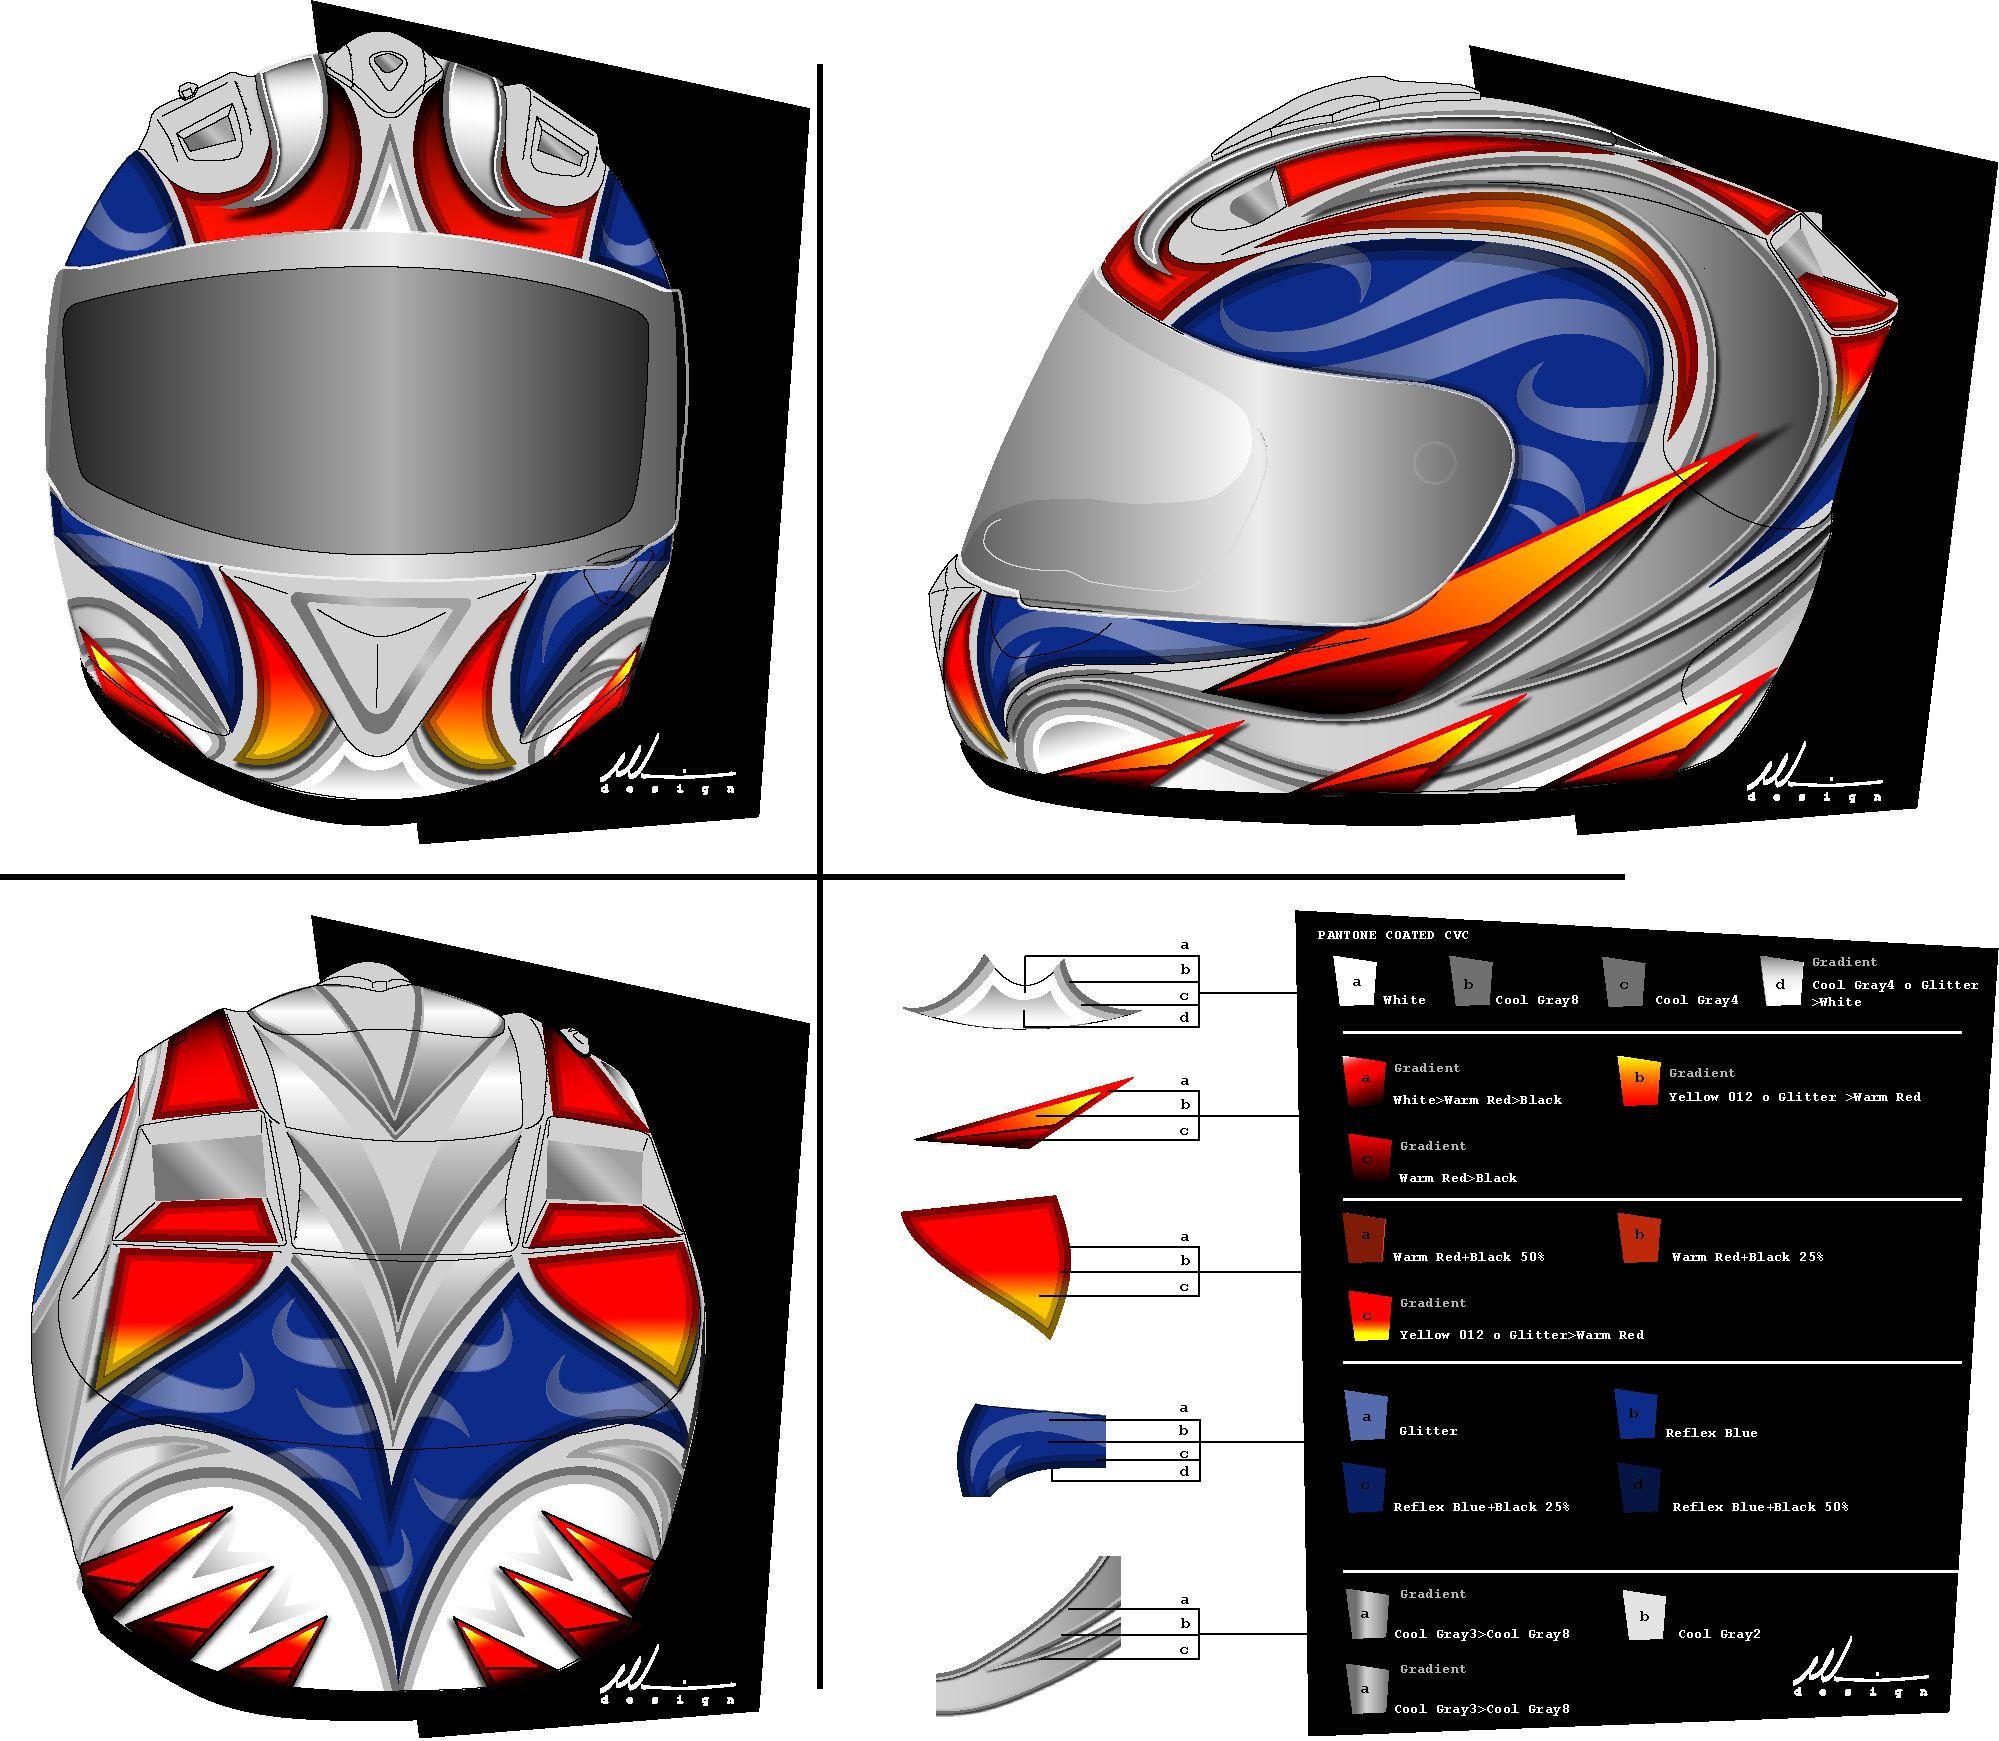 Marushin Helmet Graphic Design My Aesthetic Contribution To The - Motorcycle helmet decals graphicsmotorcycle helmet graphics the easy helmet upgrade